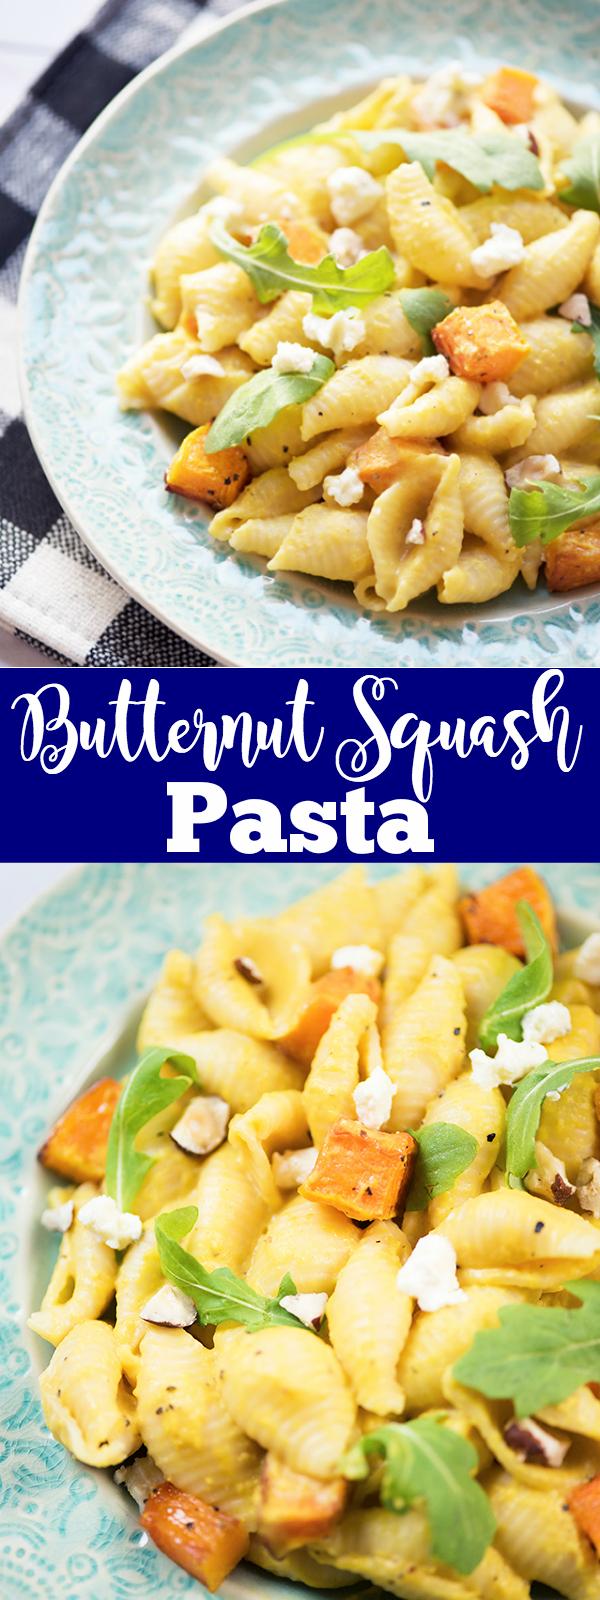 butternut squash pasta